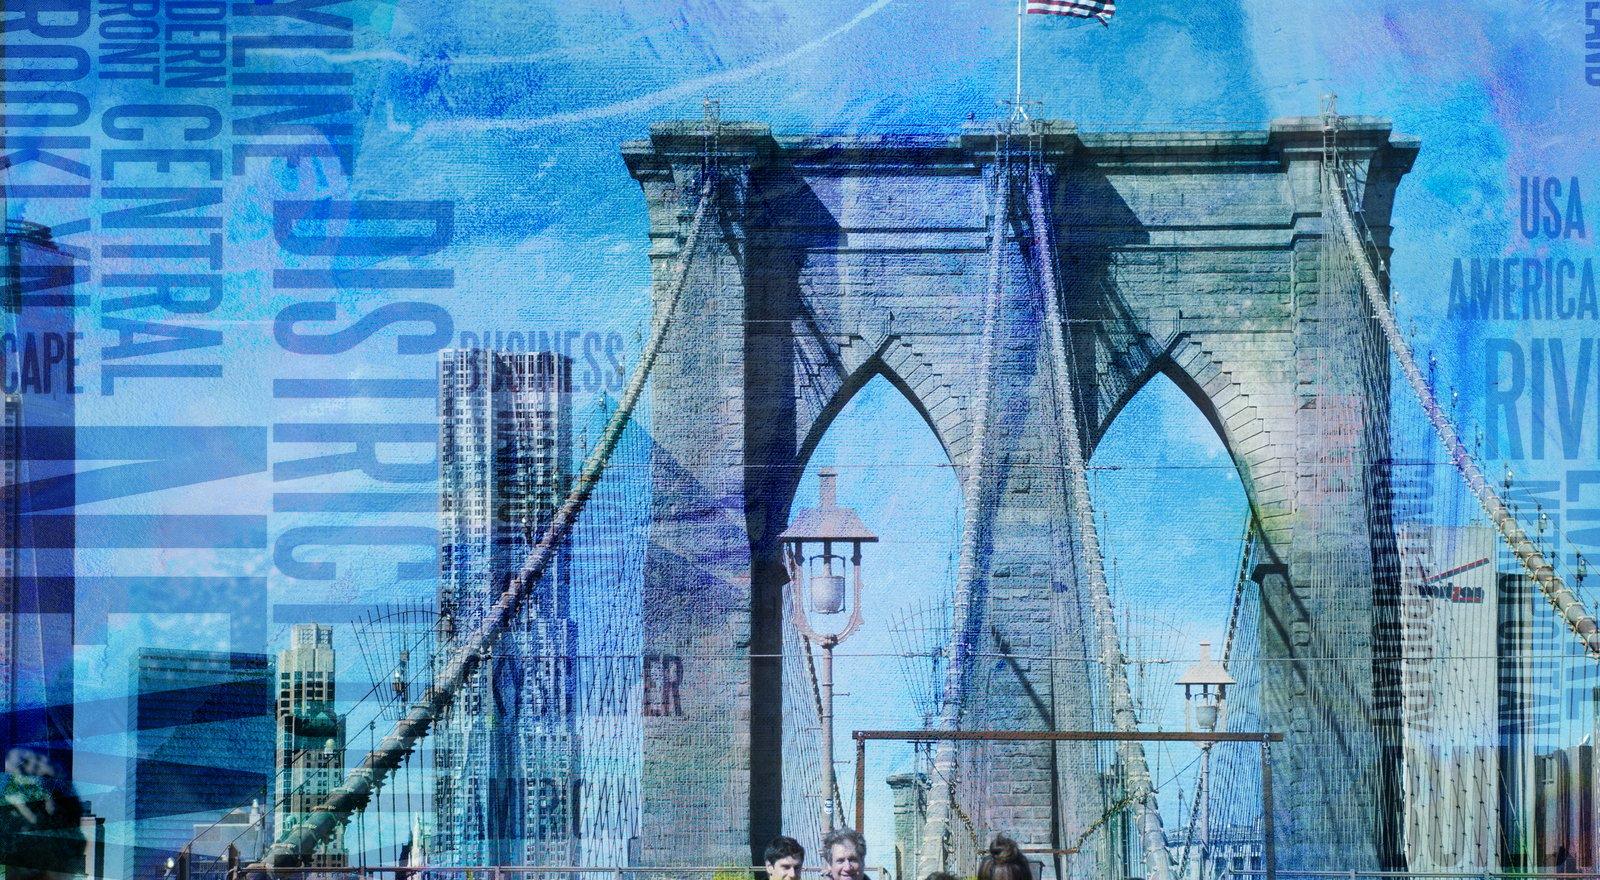 Bowery Manhattan, NY Private Investigator